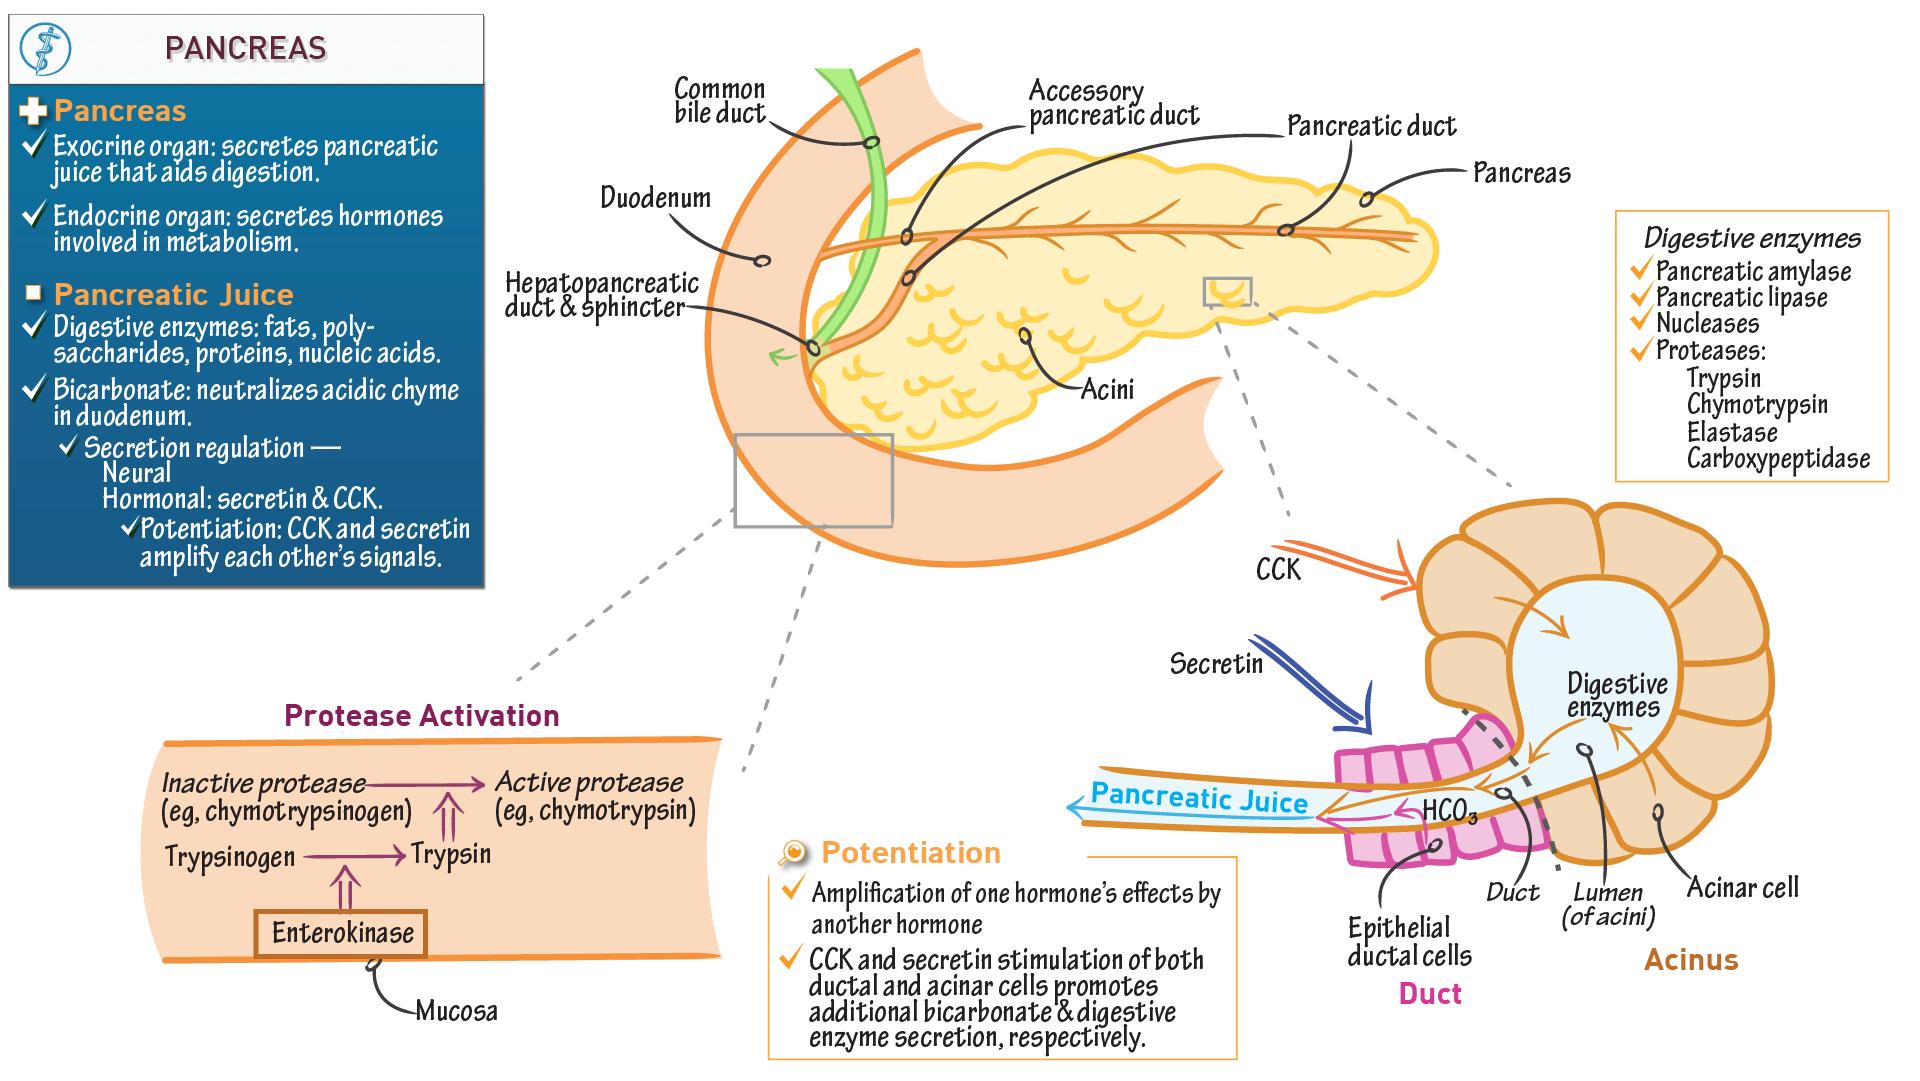 The Gastrointestinal System Exocrine Pancreas Draw It To Know It